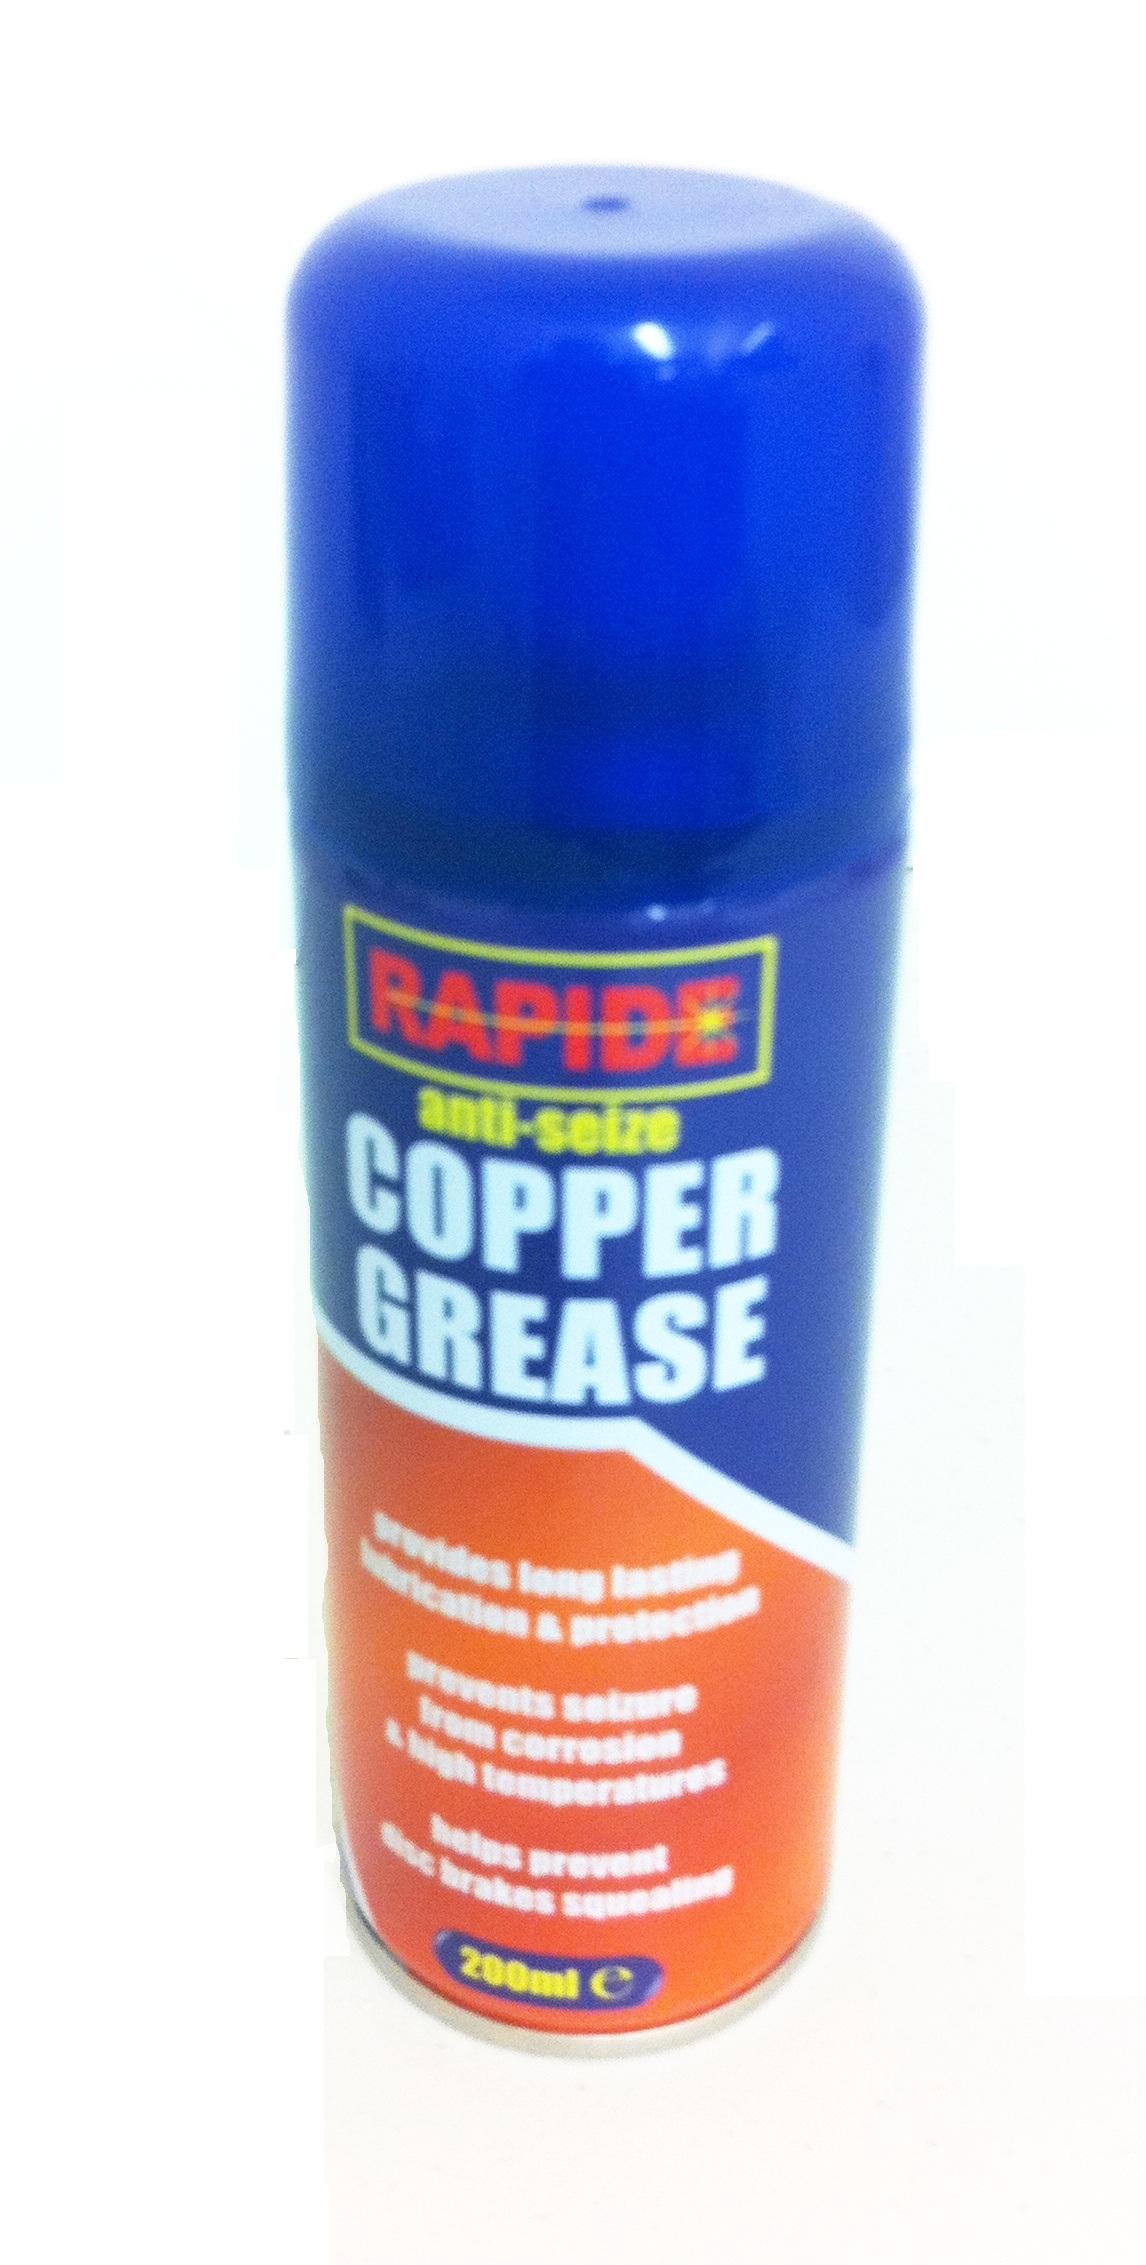 Copper Grease 200ml Spray